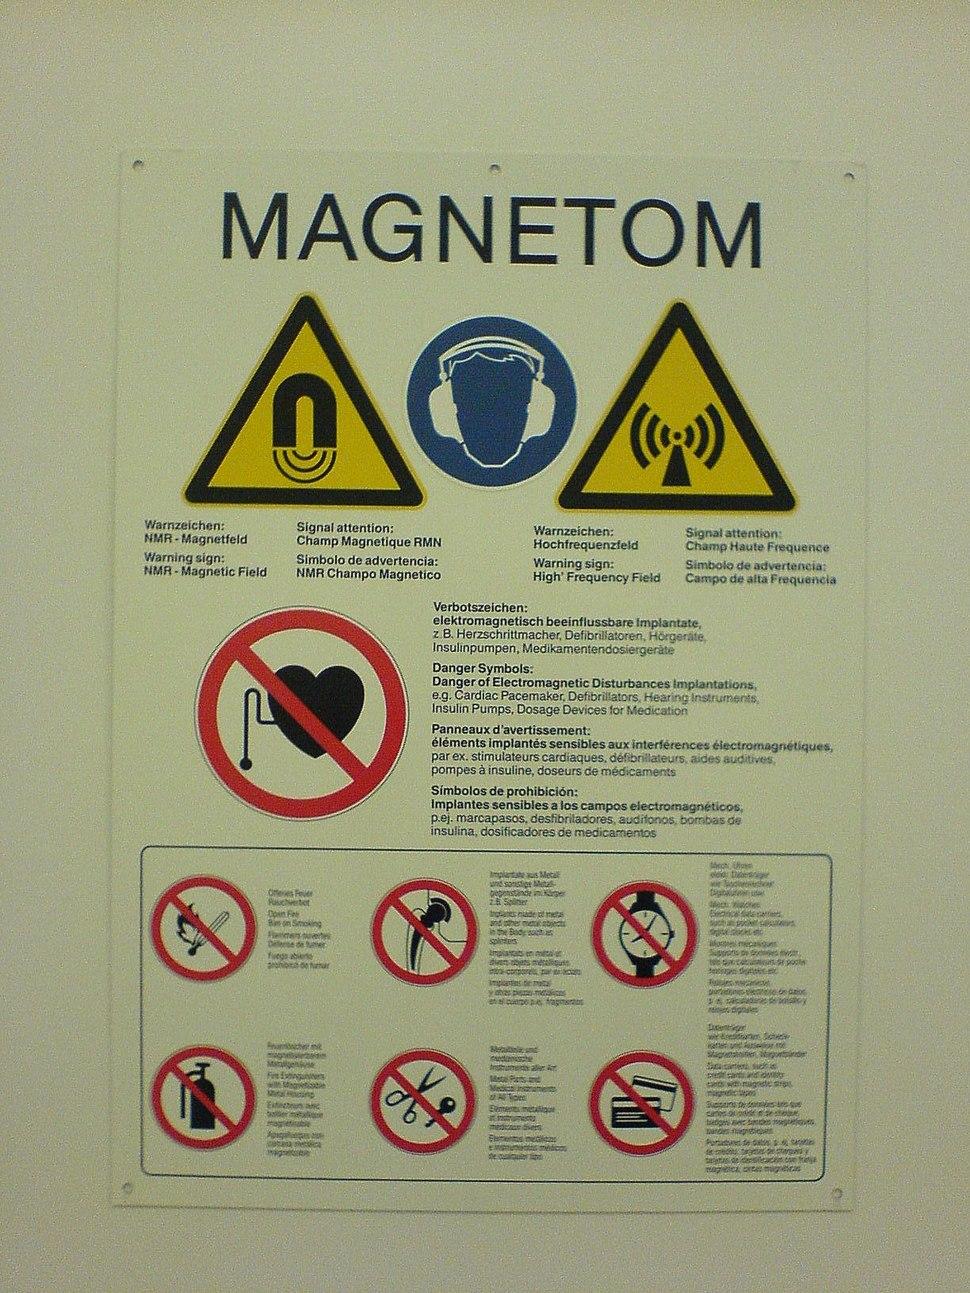 Magnetom signs